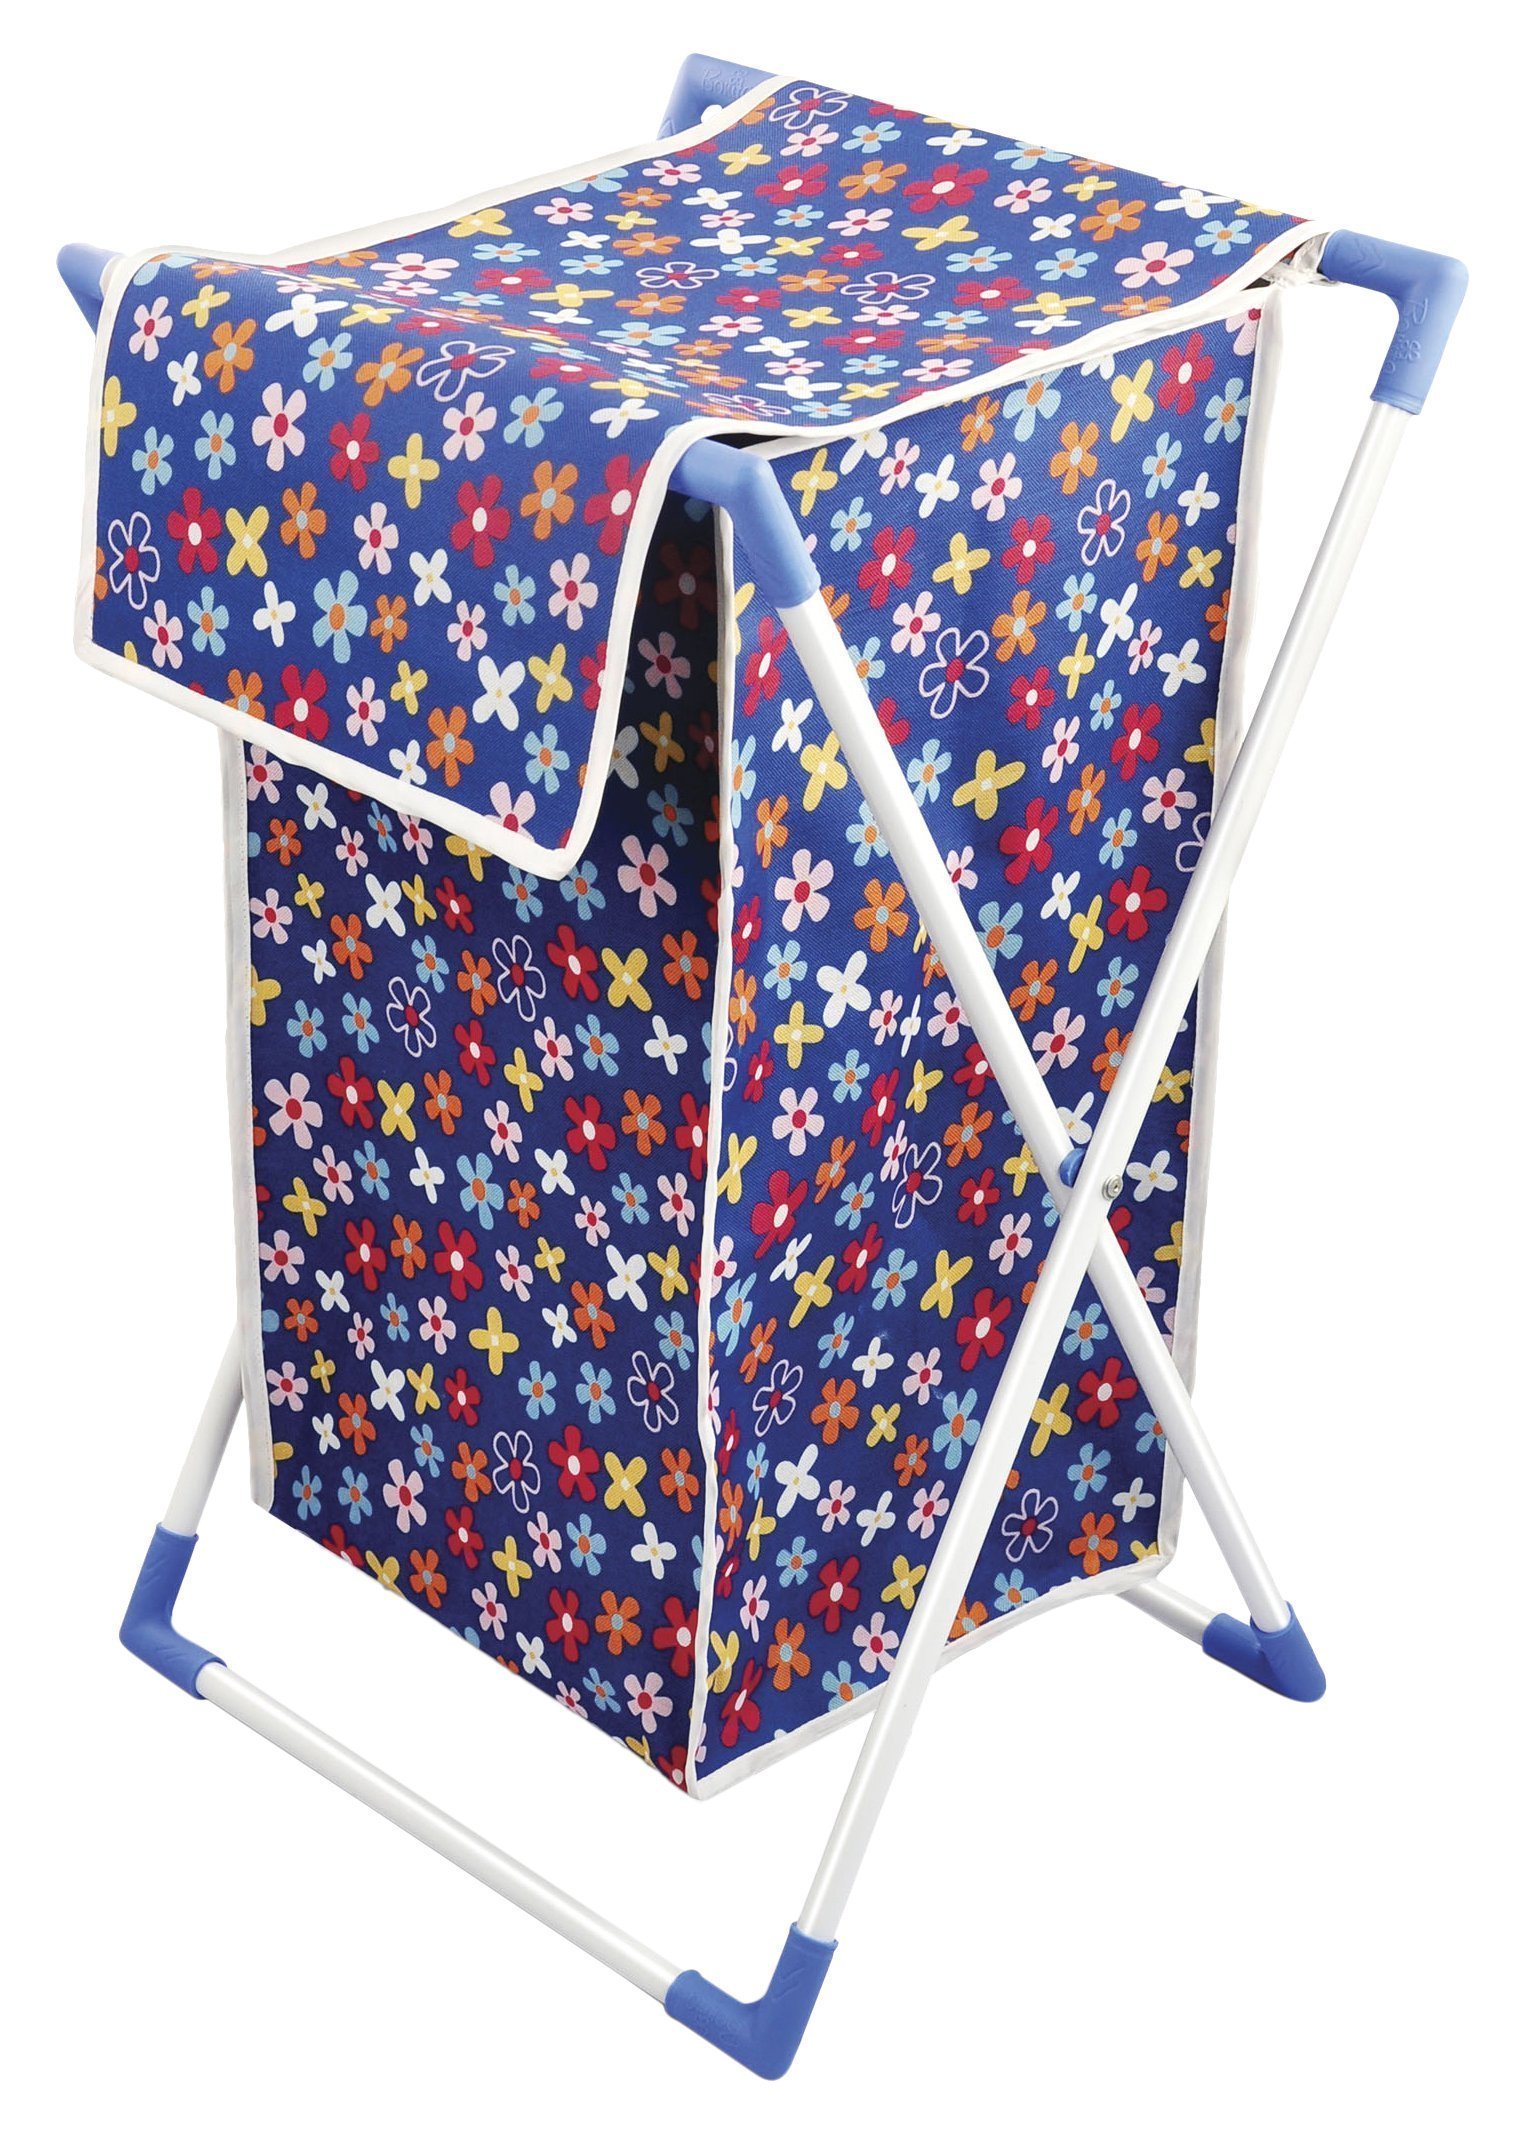 Bonita Cesta Laundry Basket, LB02-40BF